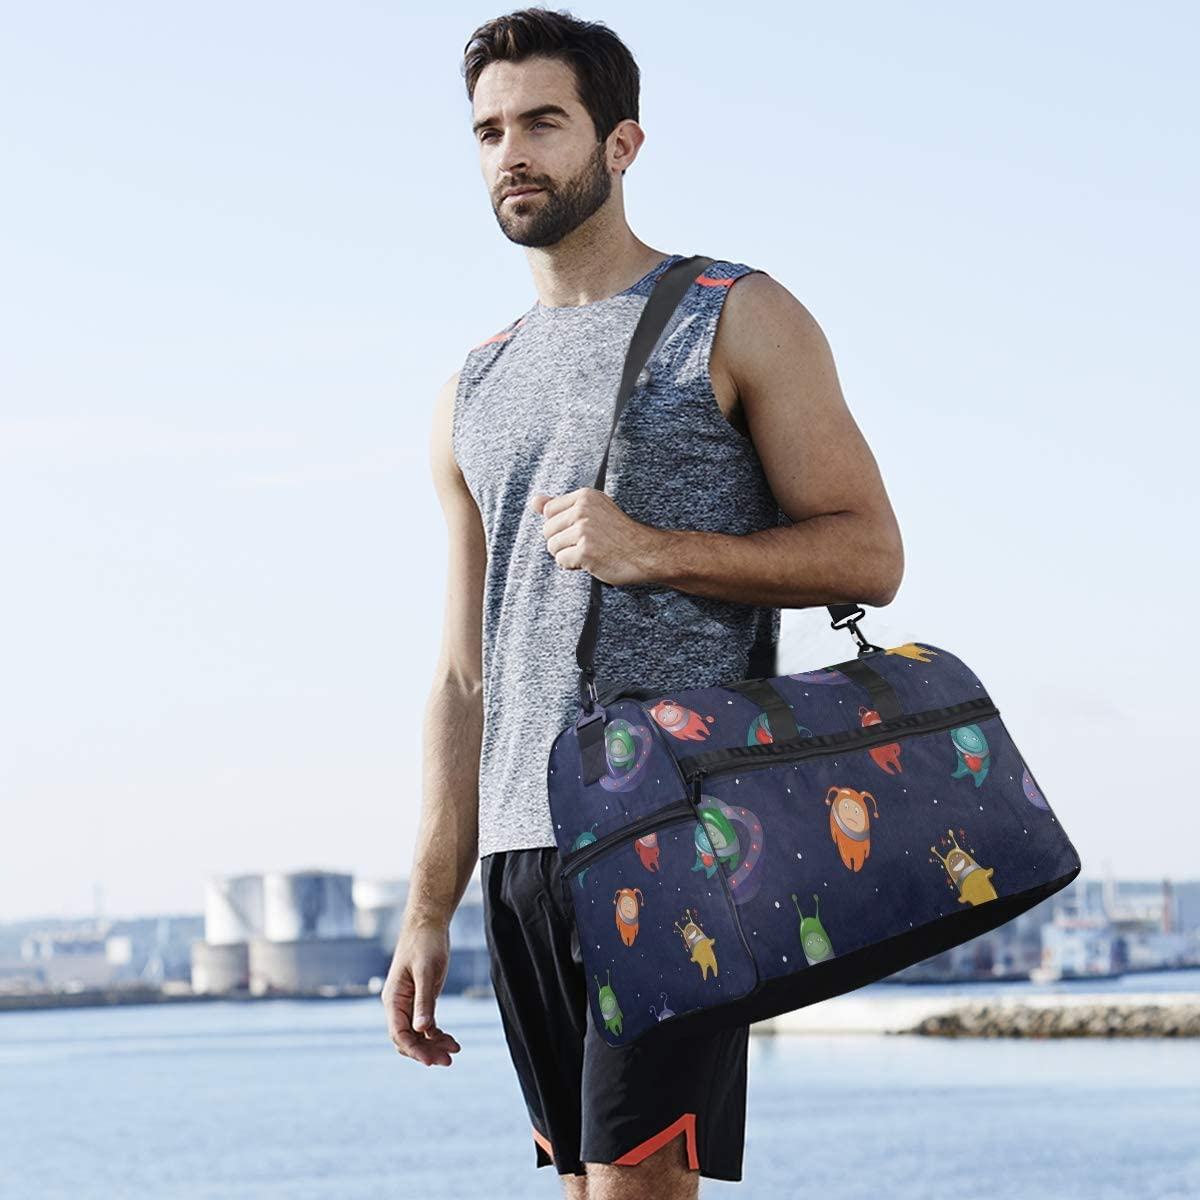 Gym Bag Cartoon Alien Space Starry Planet Duffle Bag Large Sport Travel Bags for Men Women